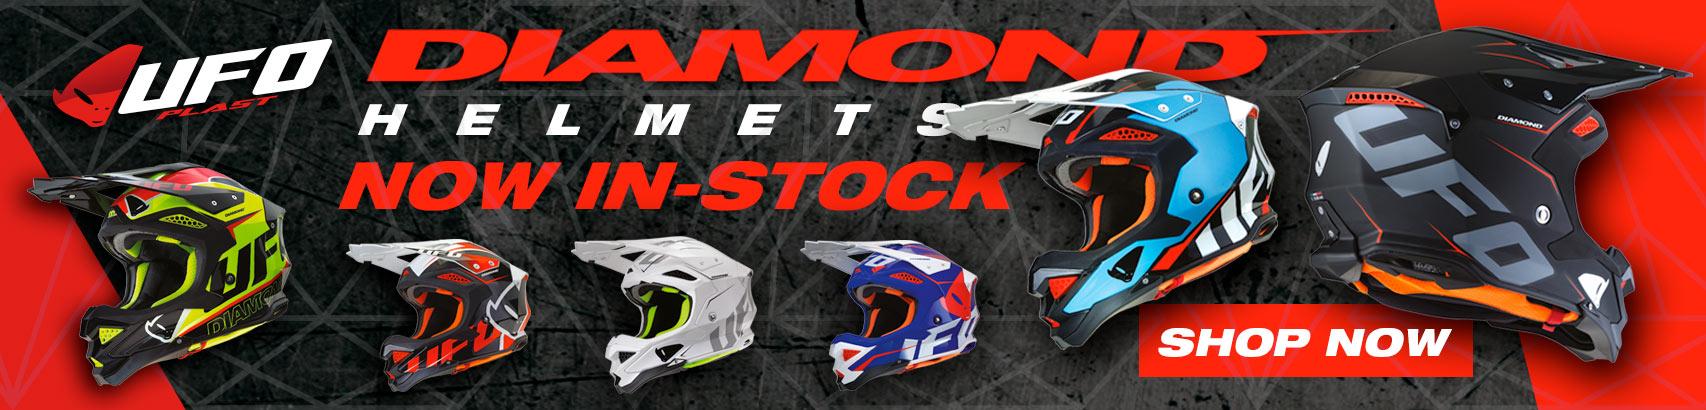 2018 UFO Diamond MX Helmets